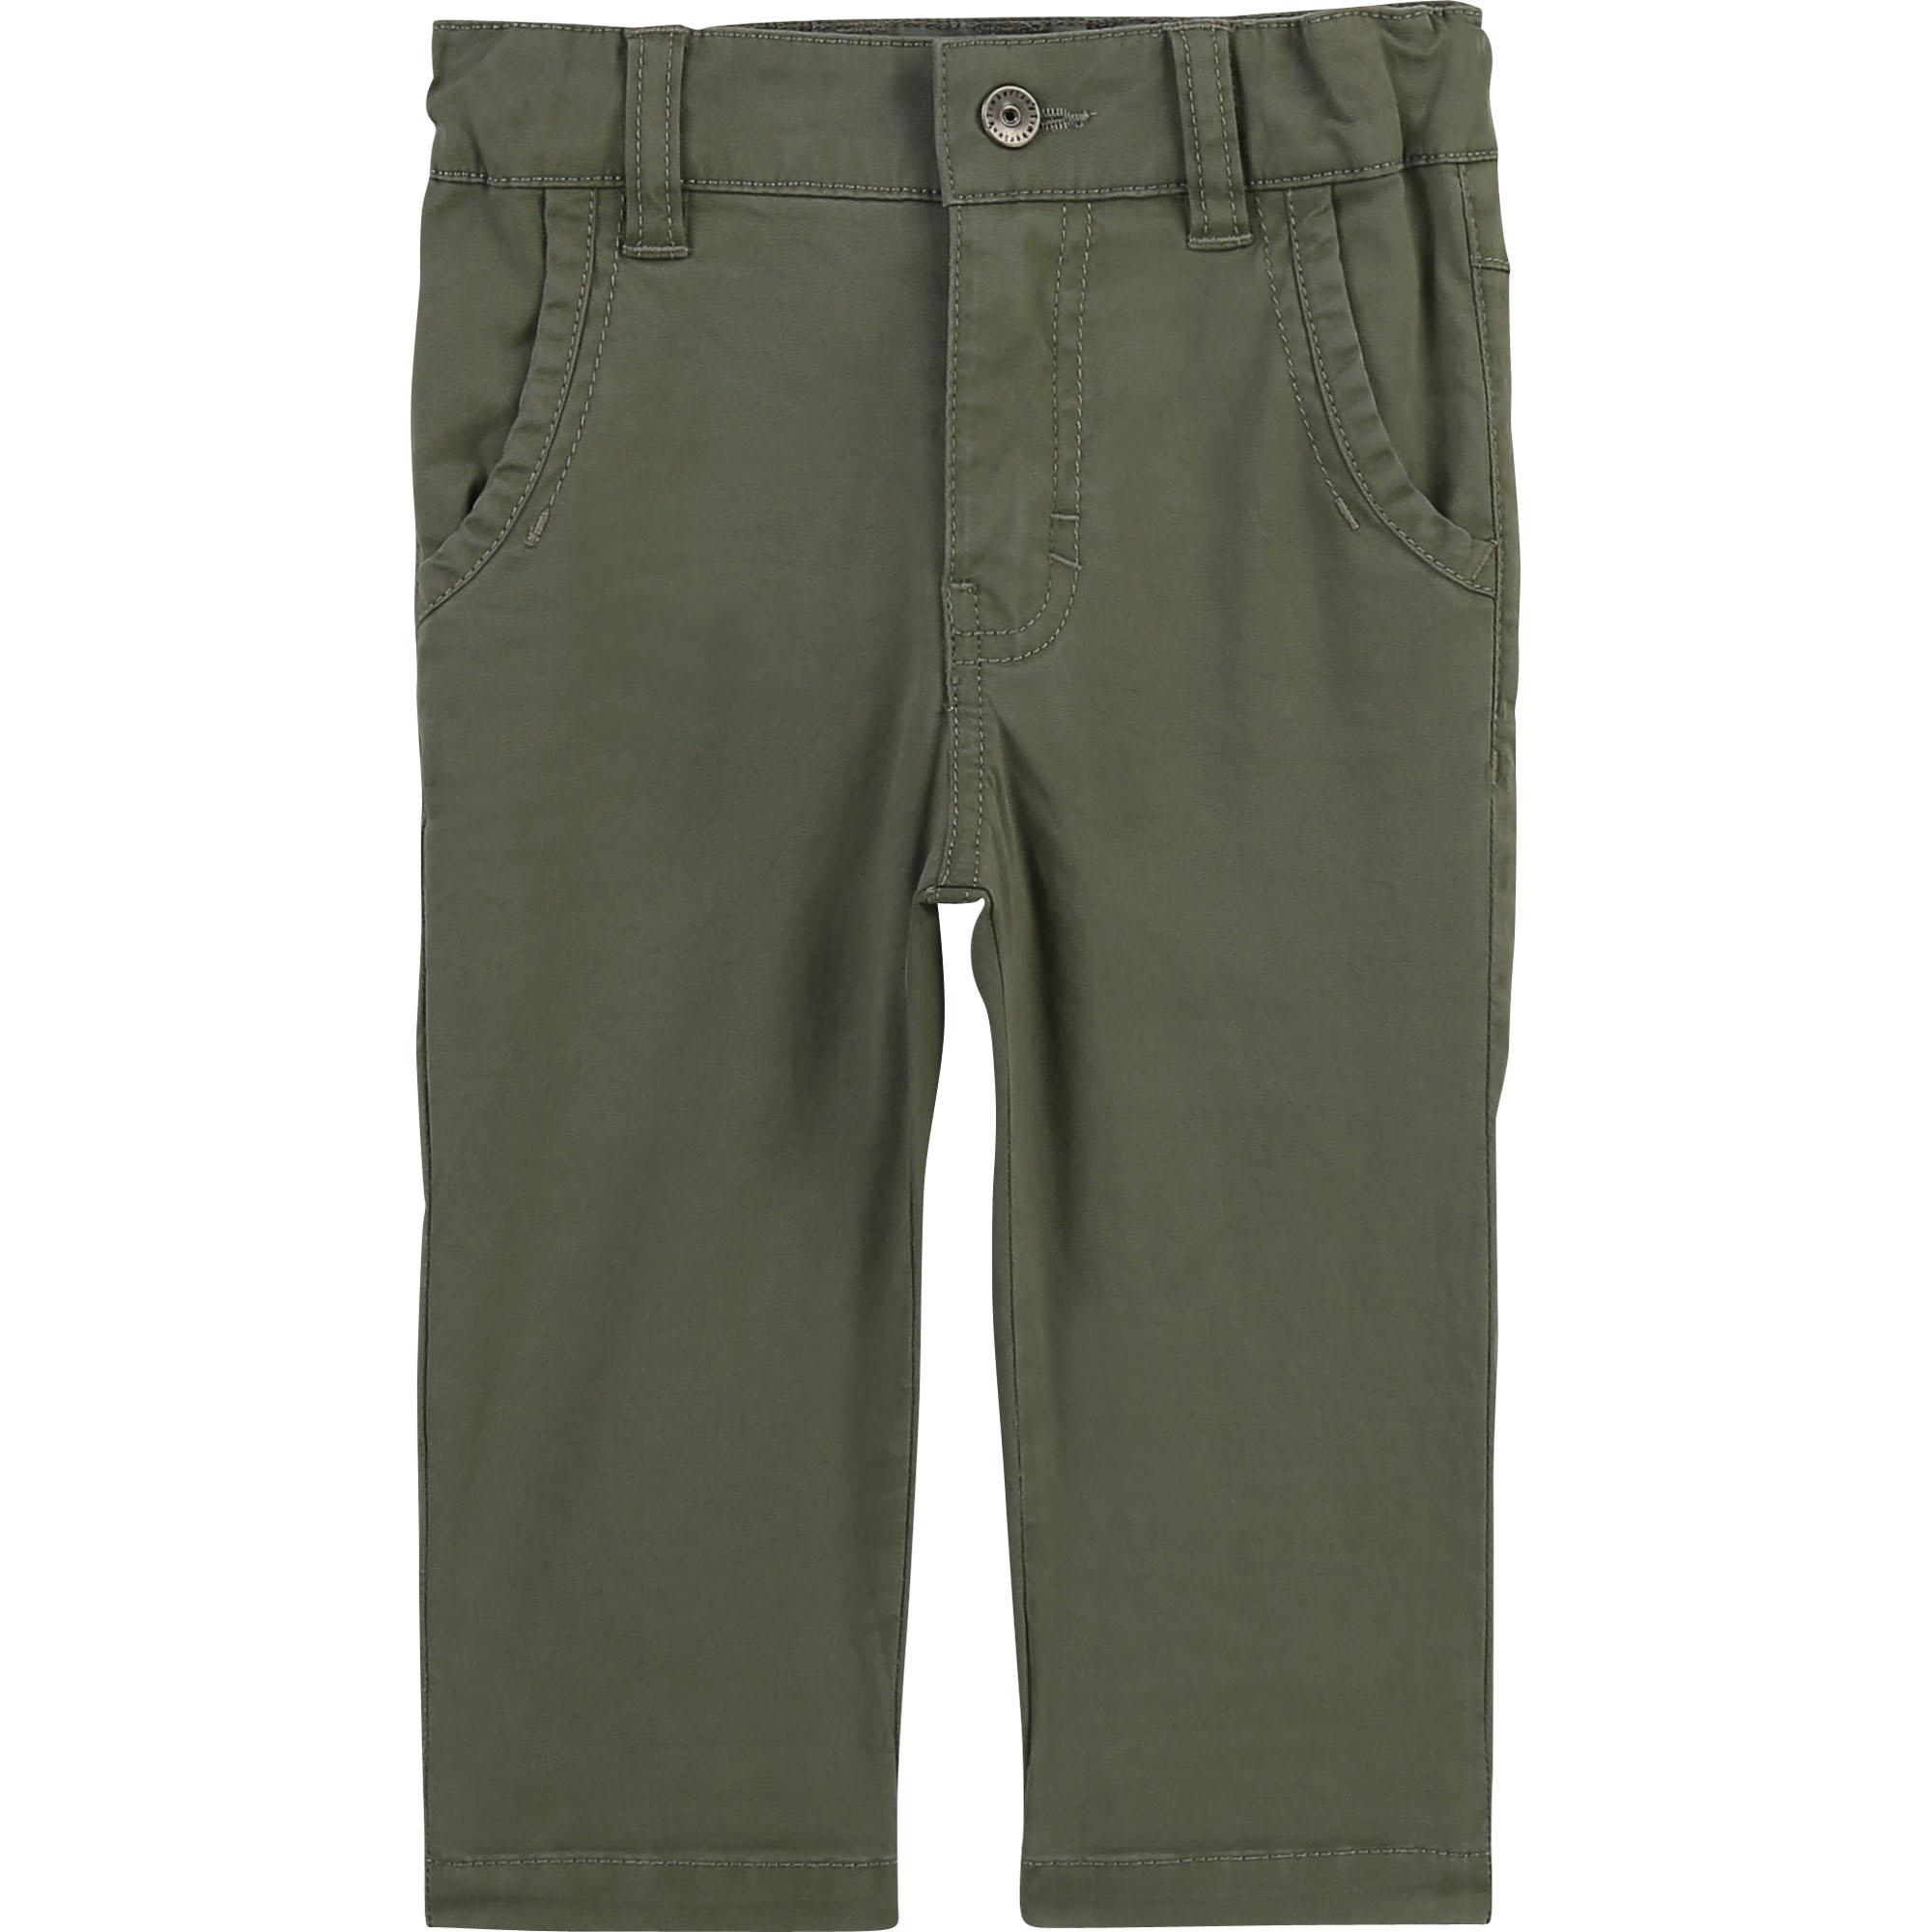 Pantalon chino ajustable TIMBERLAND pour GARCON